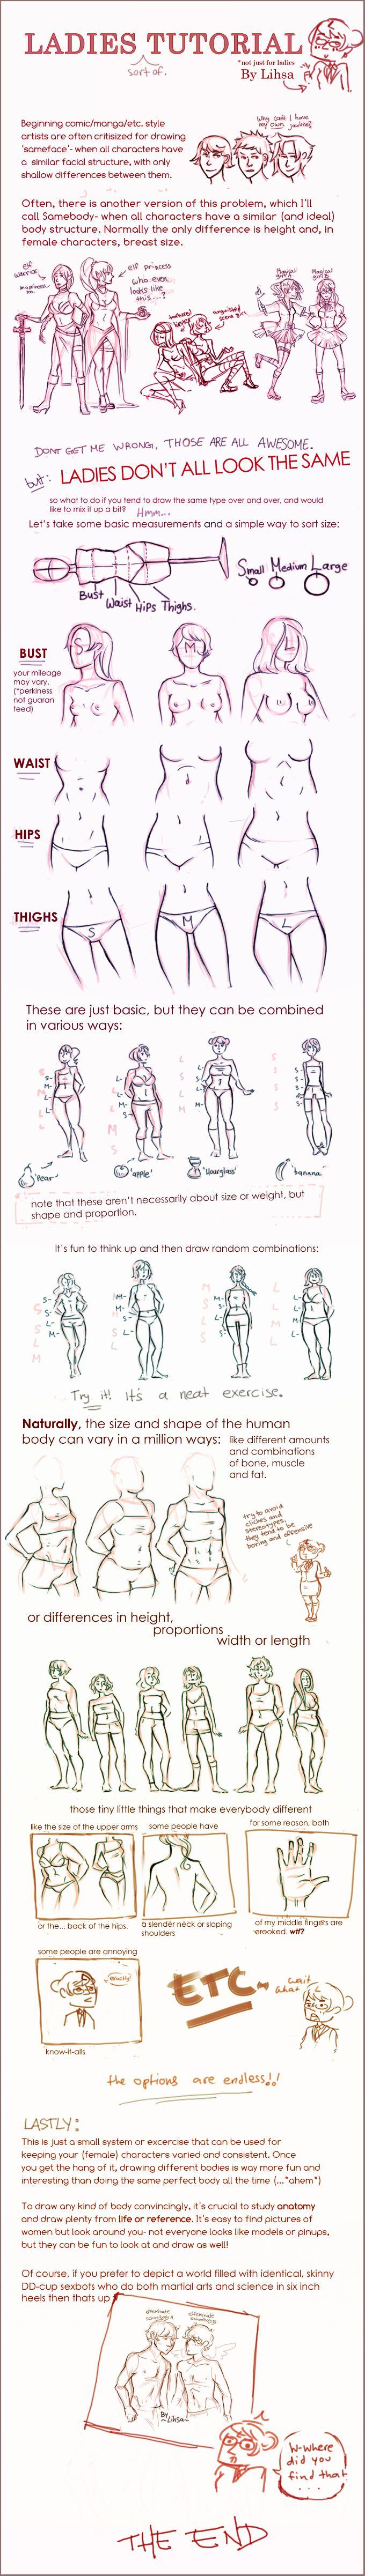 ✤    CHARACTER DESIGN REFERENCES   解剖 •  علم التشريح • анатомия • 解剖学 • anatómia • एनाटॉमी • ανατομία • 해부 • Find more at https://www.facebook.com/CharacterDesignReferences & http://www.pinterest.com/characterdesigh if you're looking for: #anatomy #anatomie #anatomia #anatomía #anatomya #anatomija #anatoomia #anatomi #anatomija    ✤